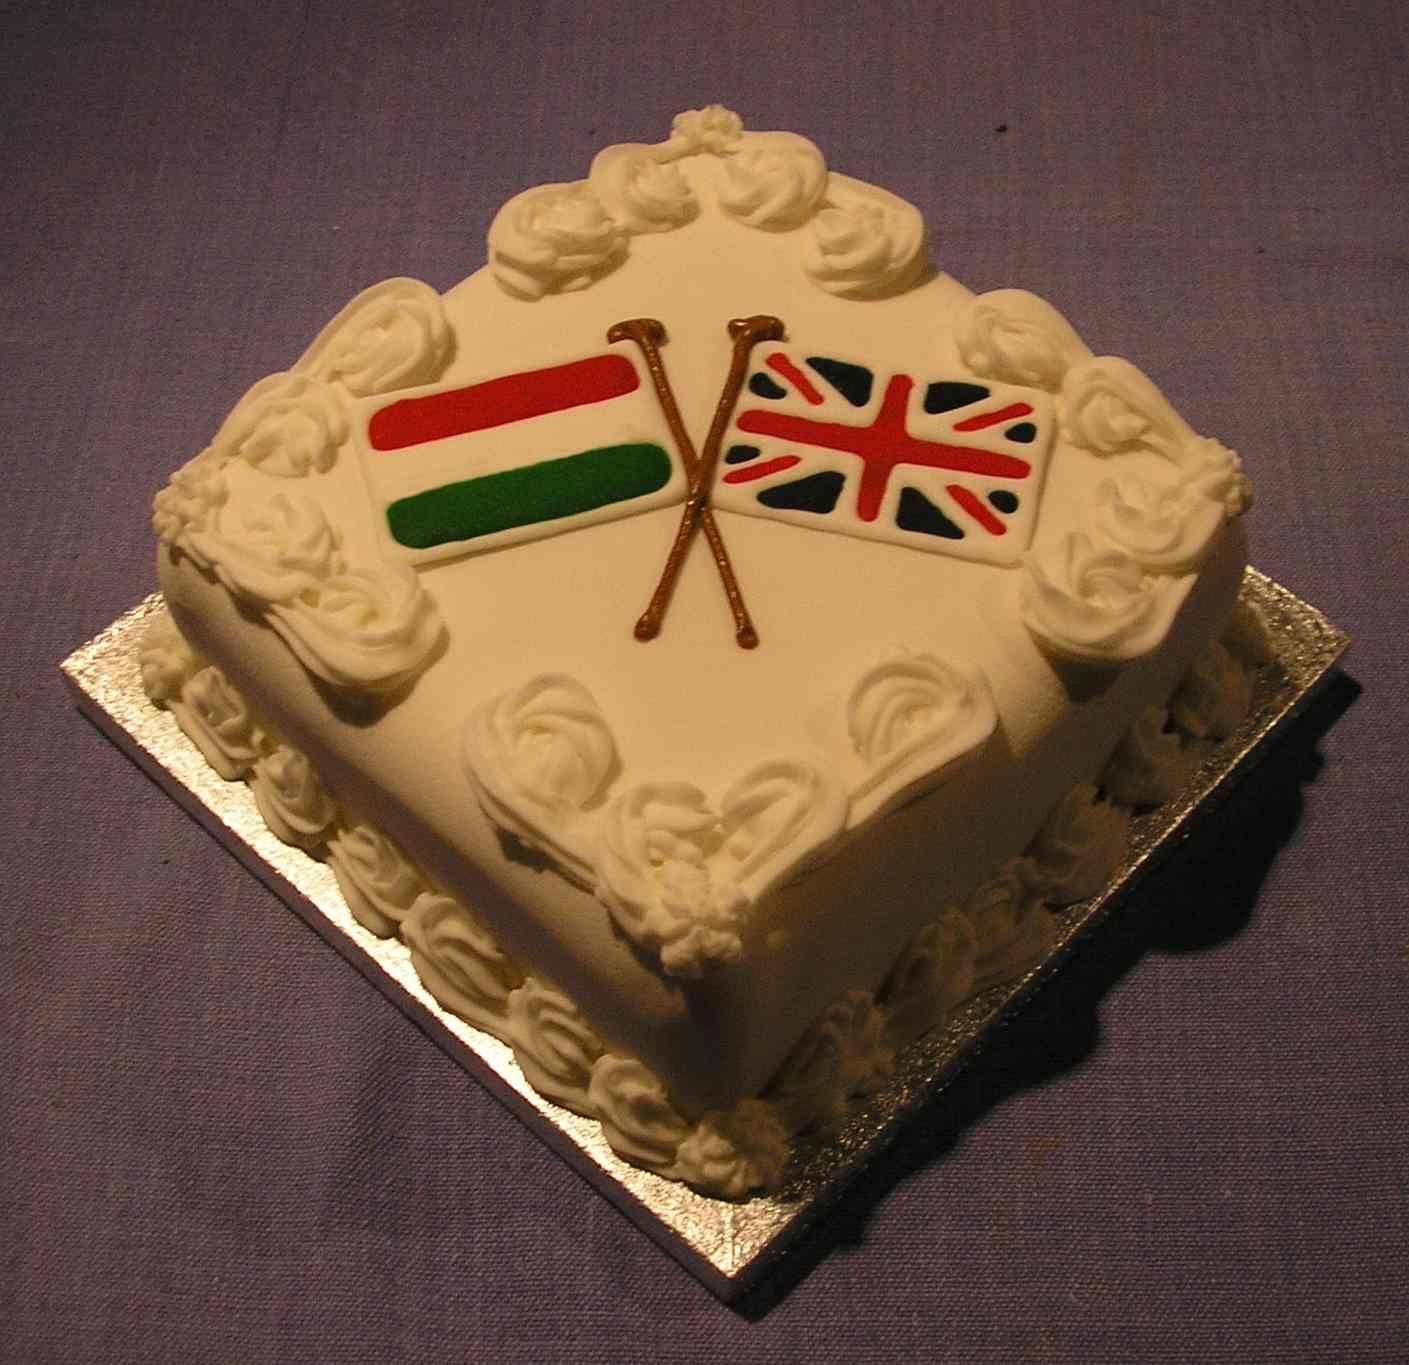 Hungary-UK